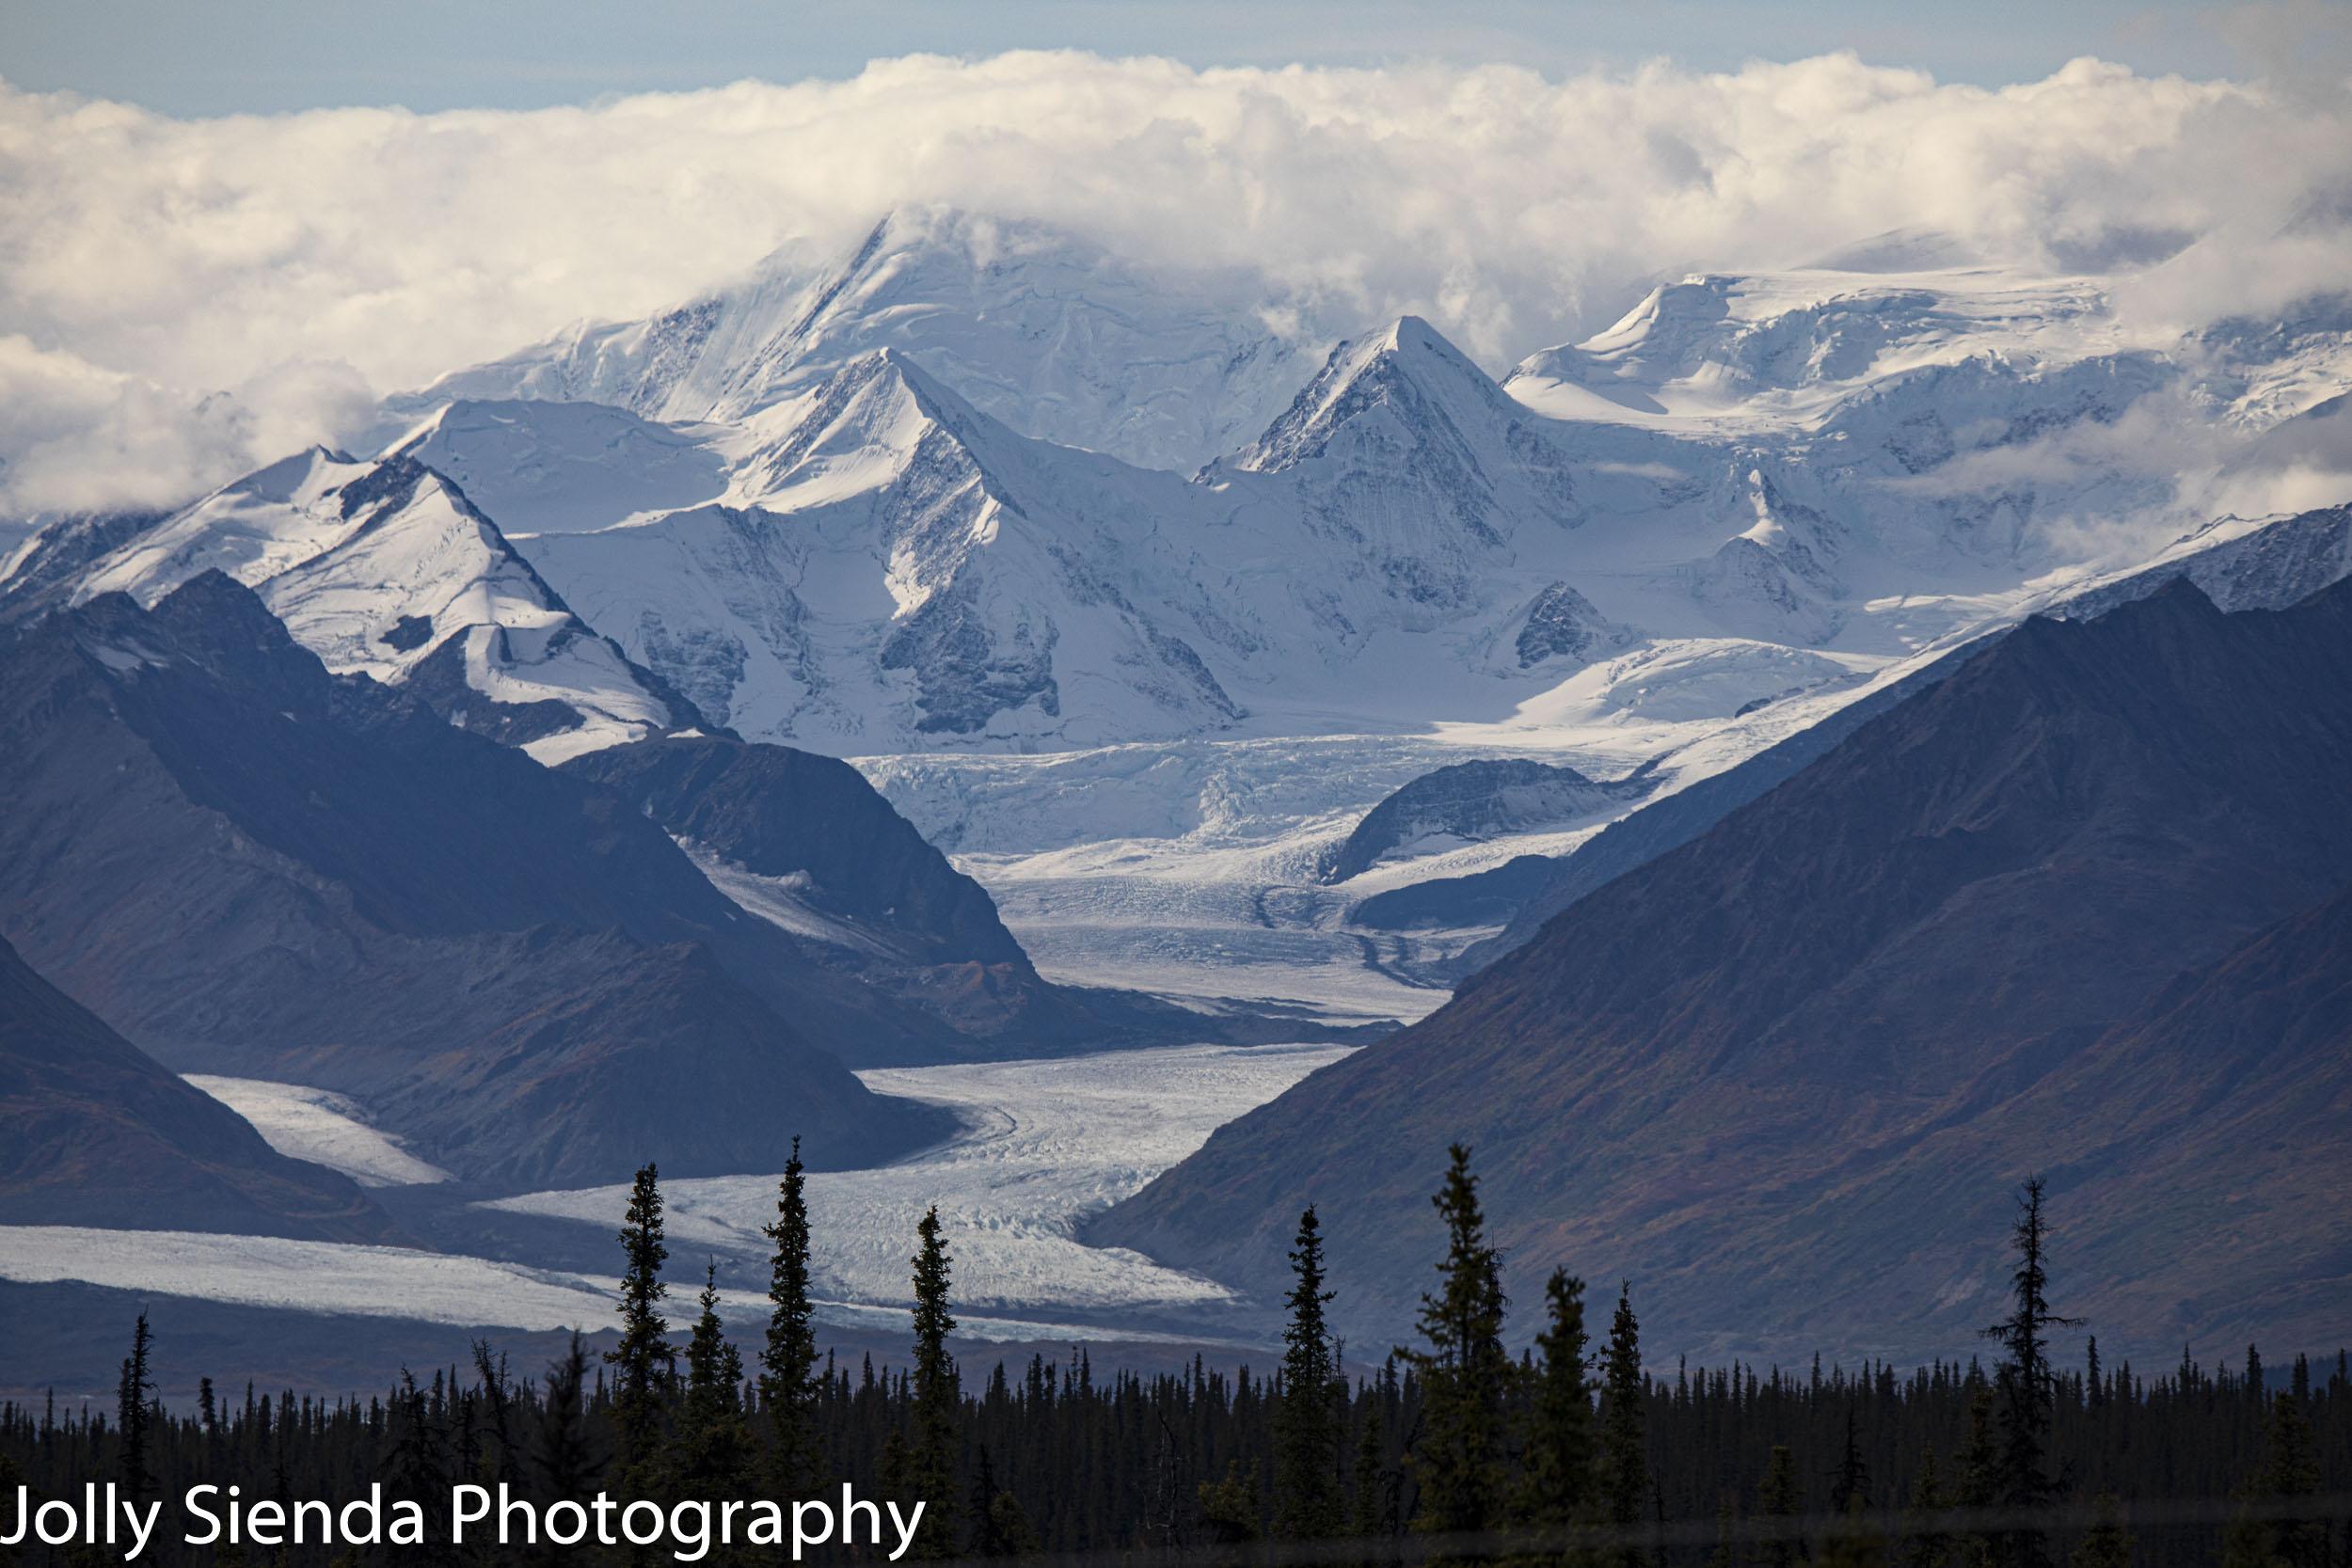 Knik Glacier view from the Glenn Highway, Alaska